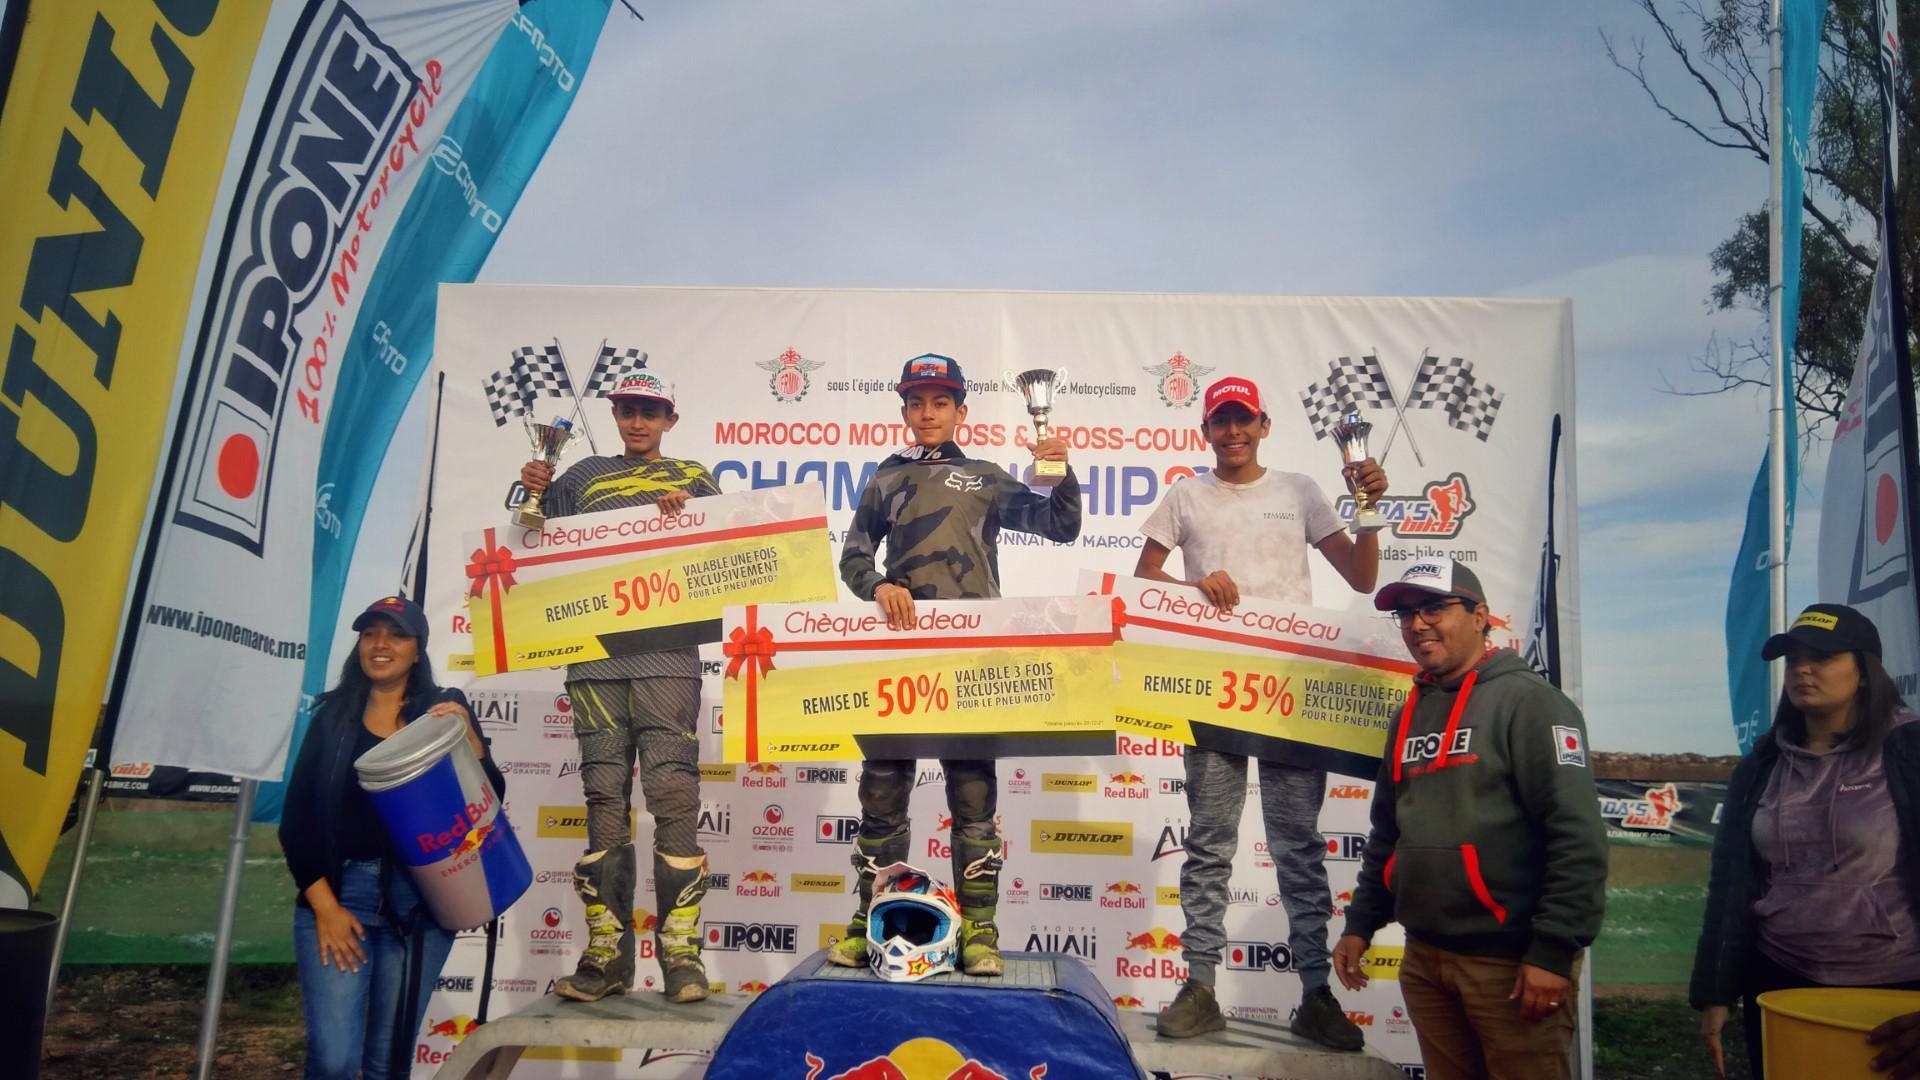 finale-du-championnat-du-maroc-de-motocross-et-cross-country-1164-4.jpg